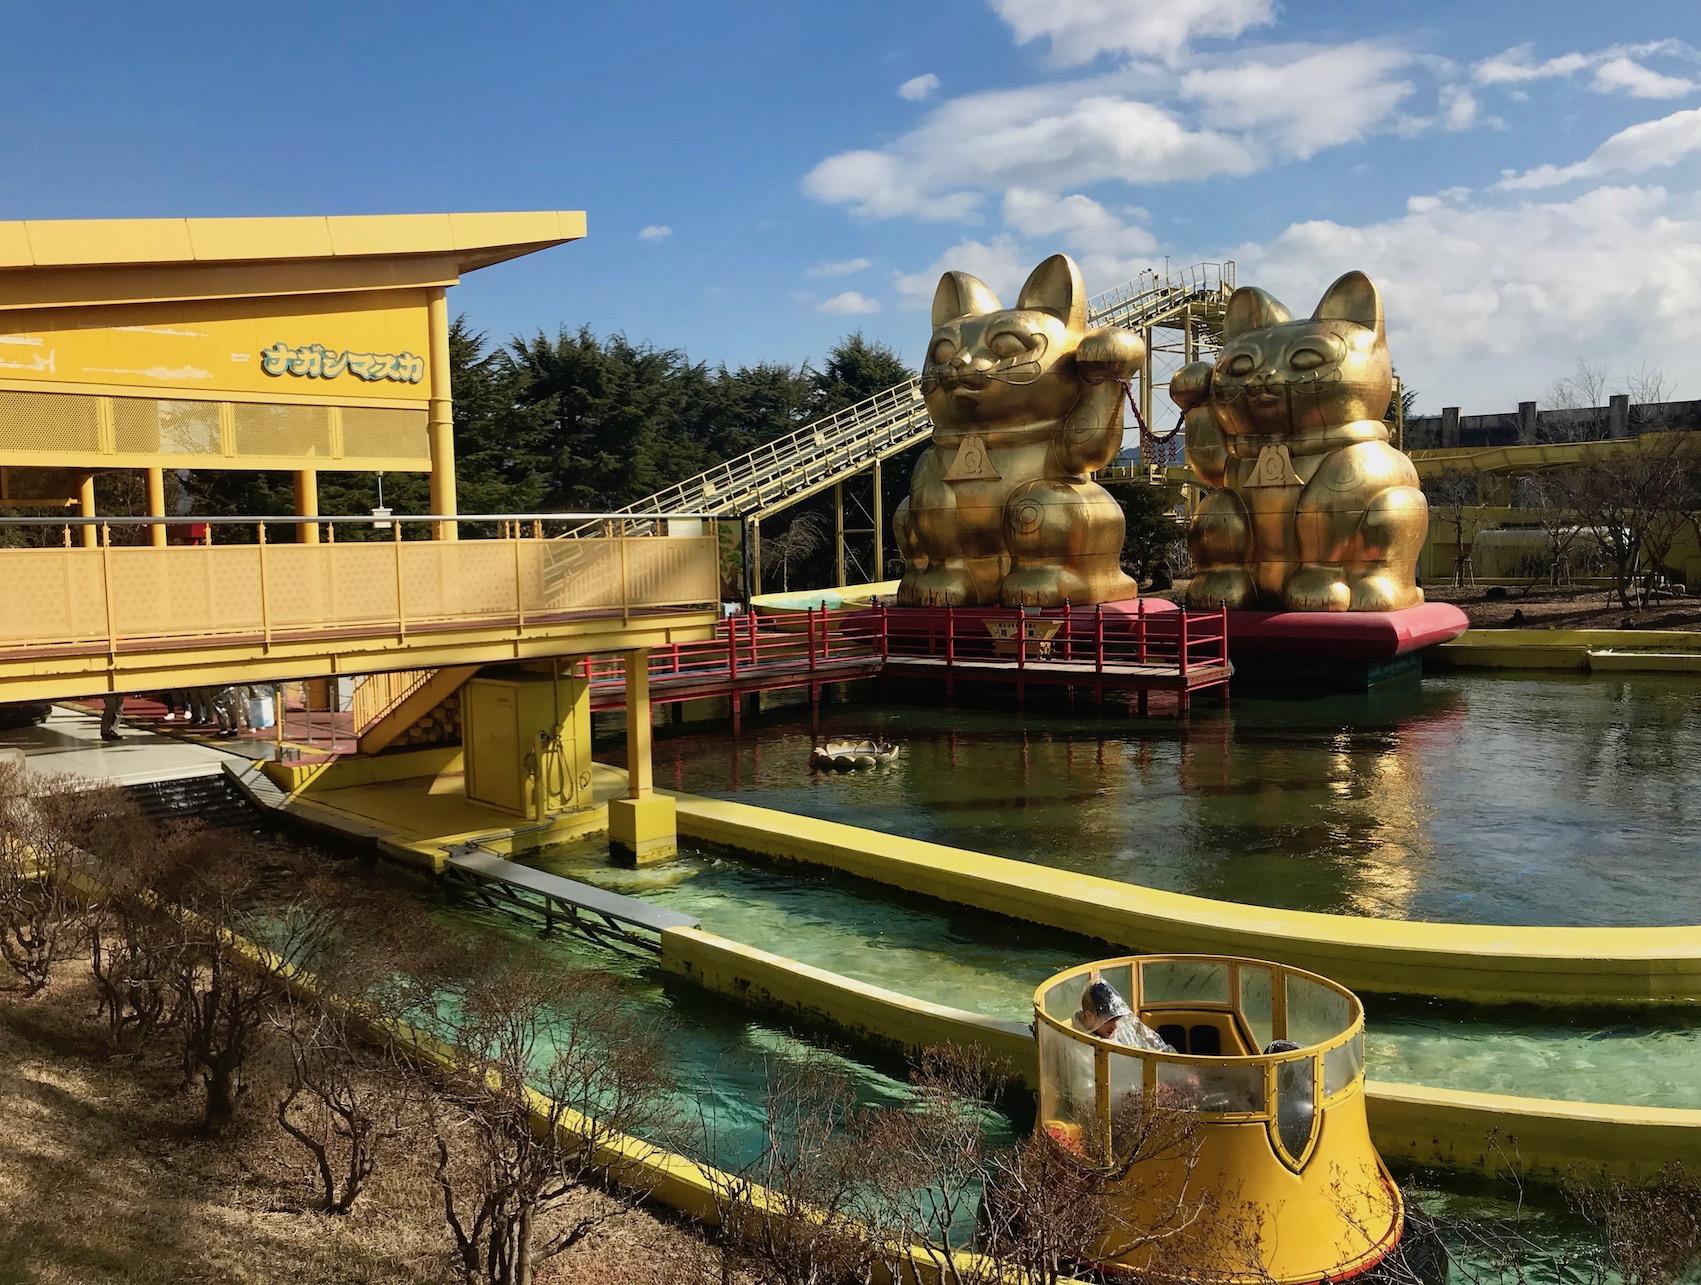 Visit Fuji-Q Highland Amusement Park Mount Fuji Japan.